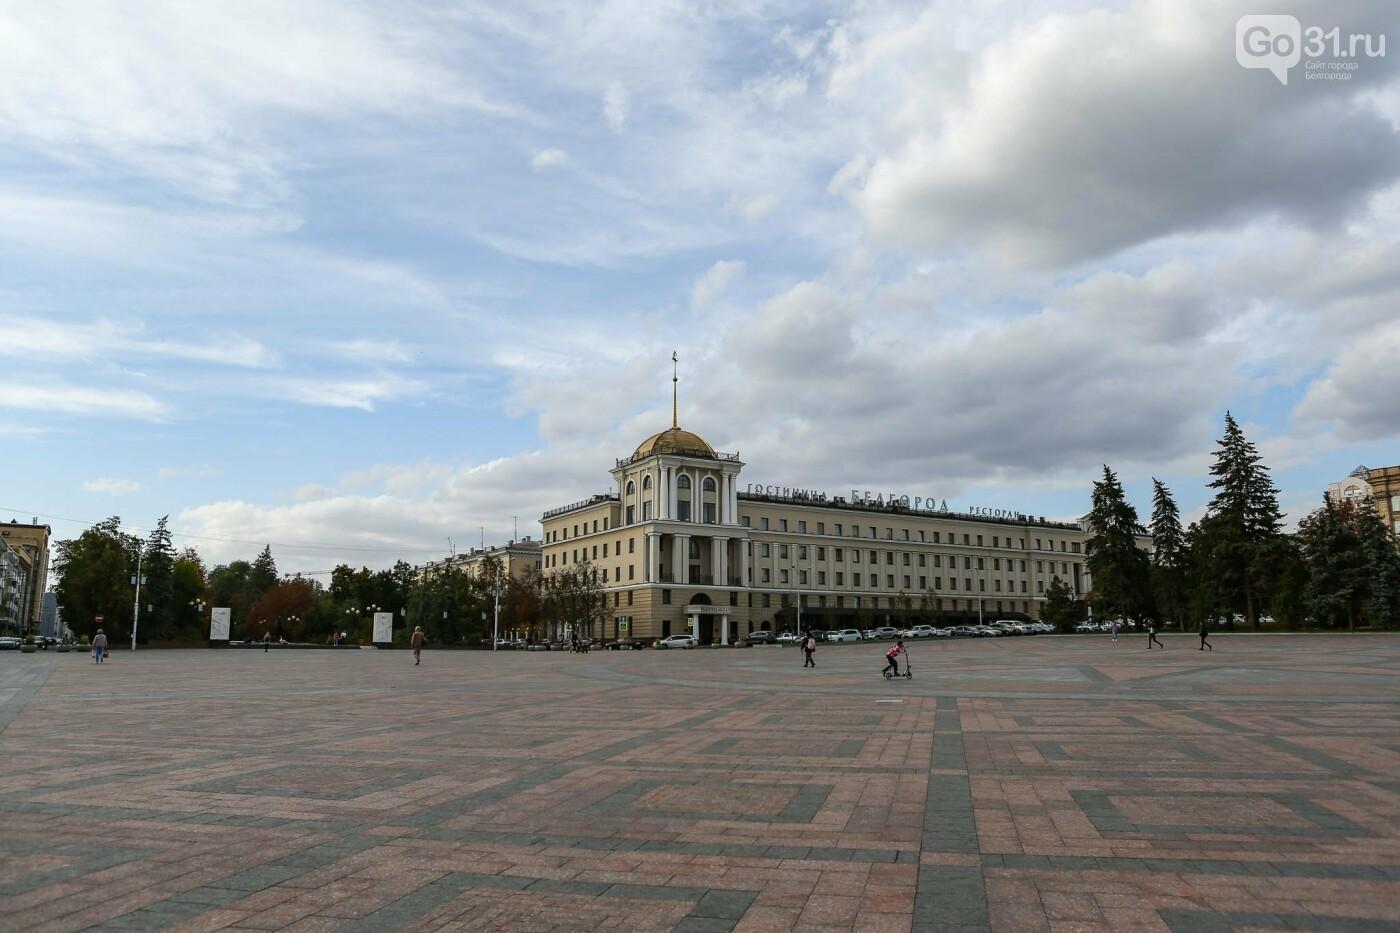 Счёт осени. Белгород желтеет к концу сентября, фото-17